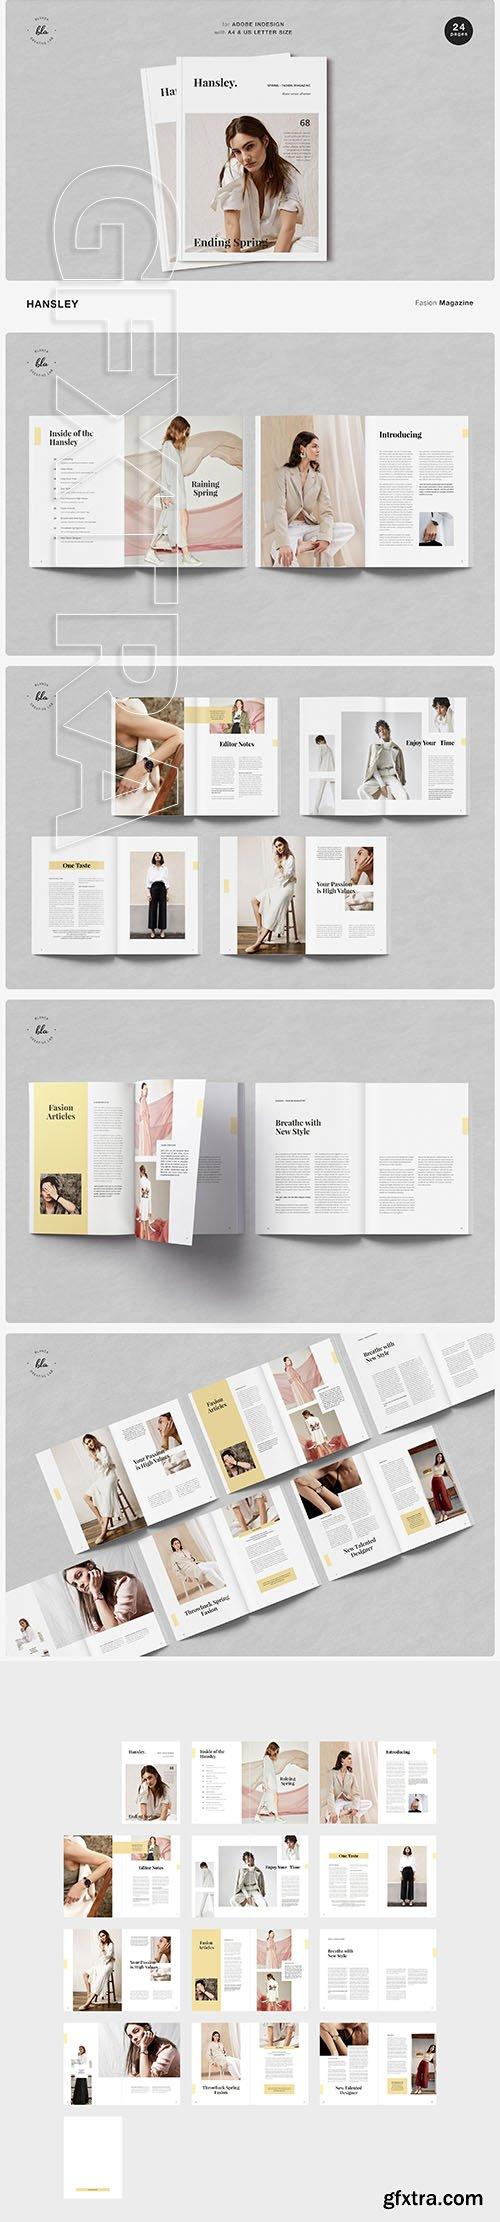 CreativeMarket - HANSLEY Fasion Magazine 3692209